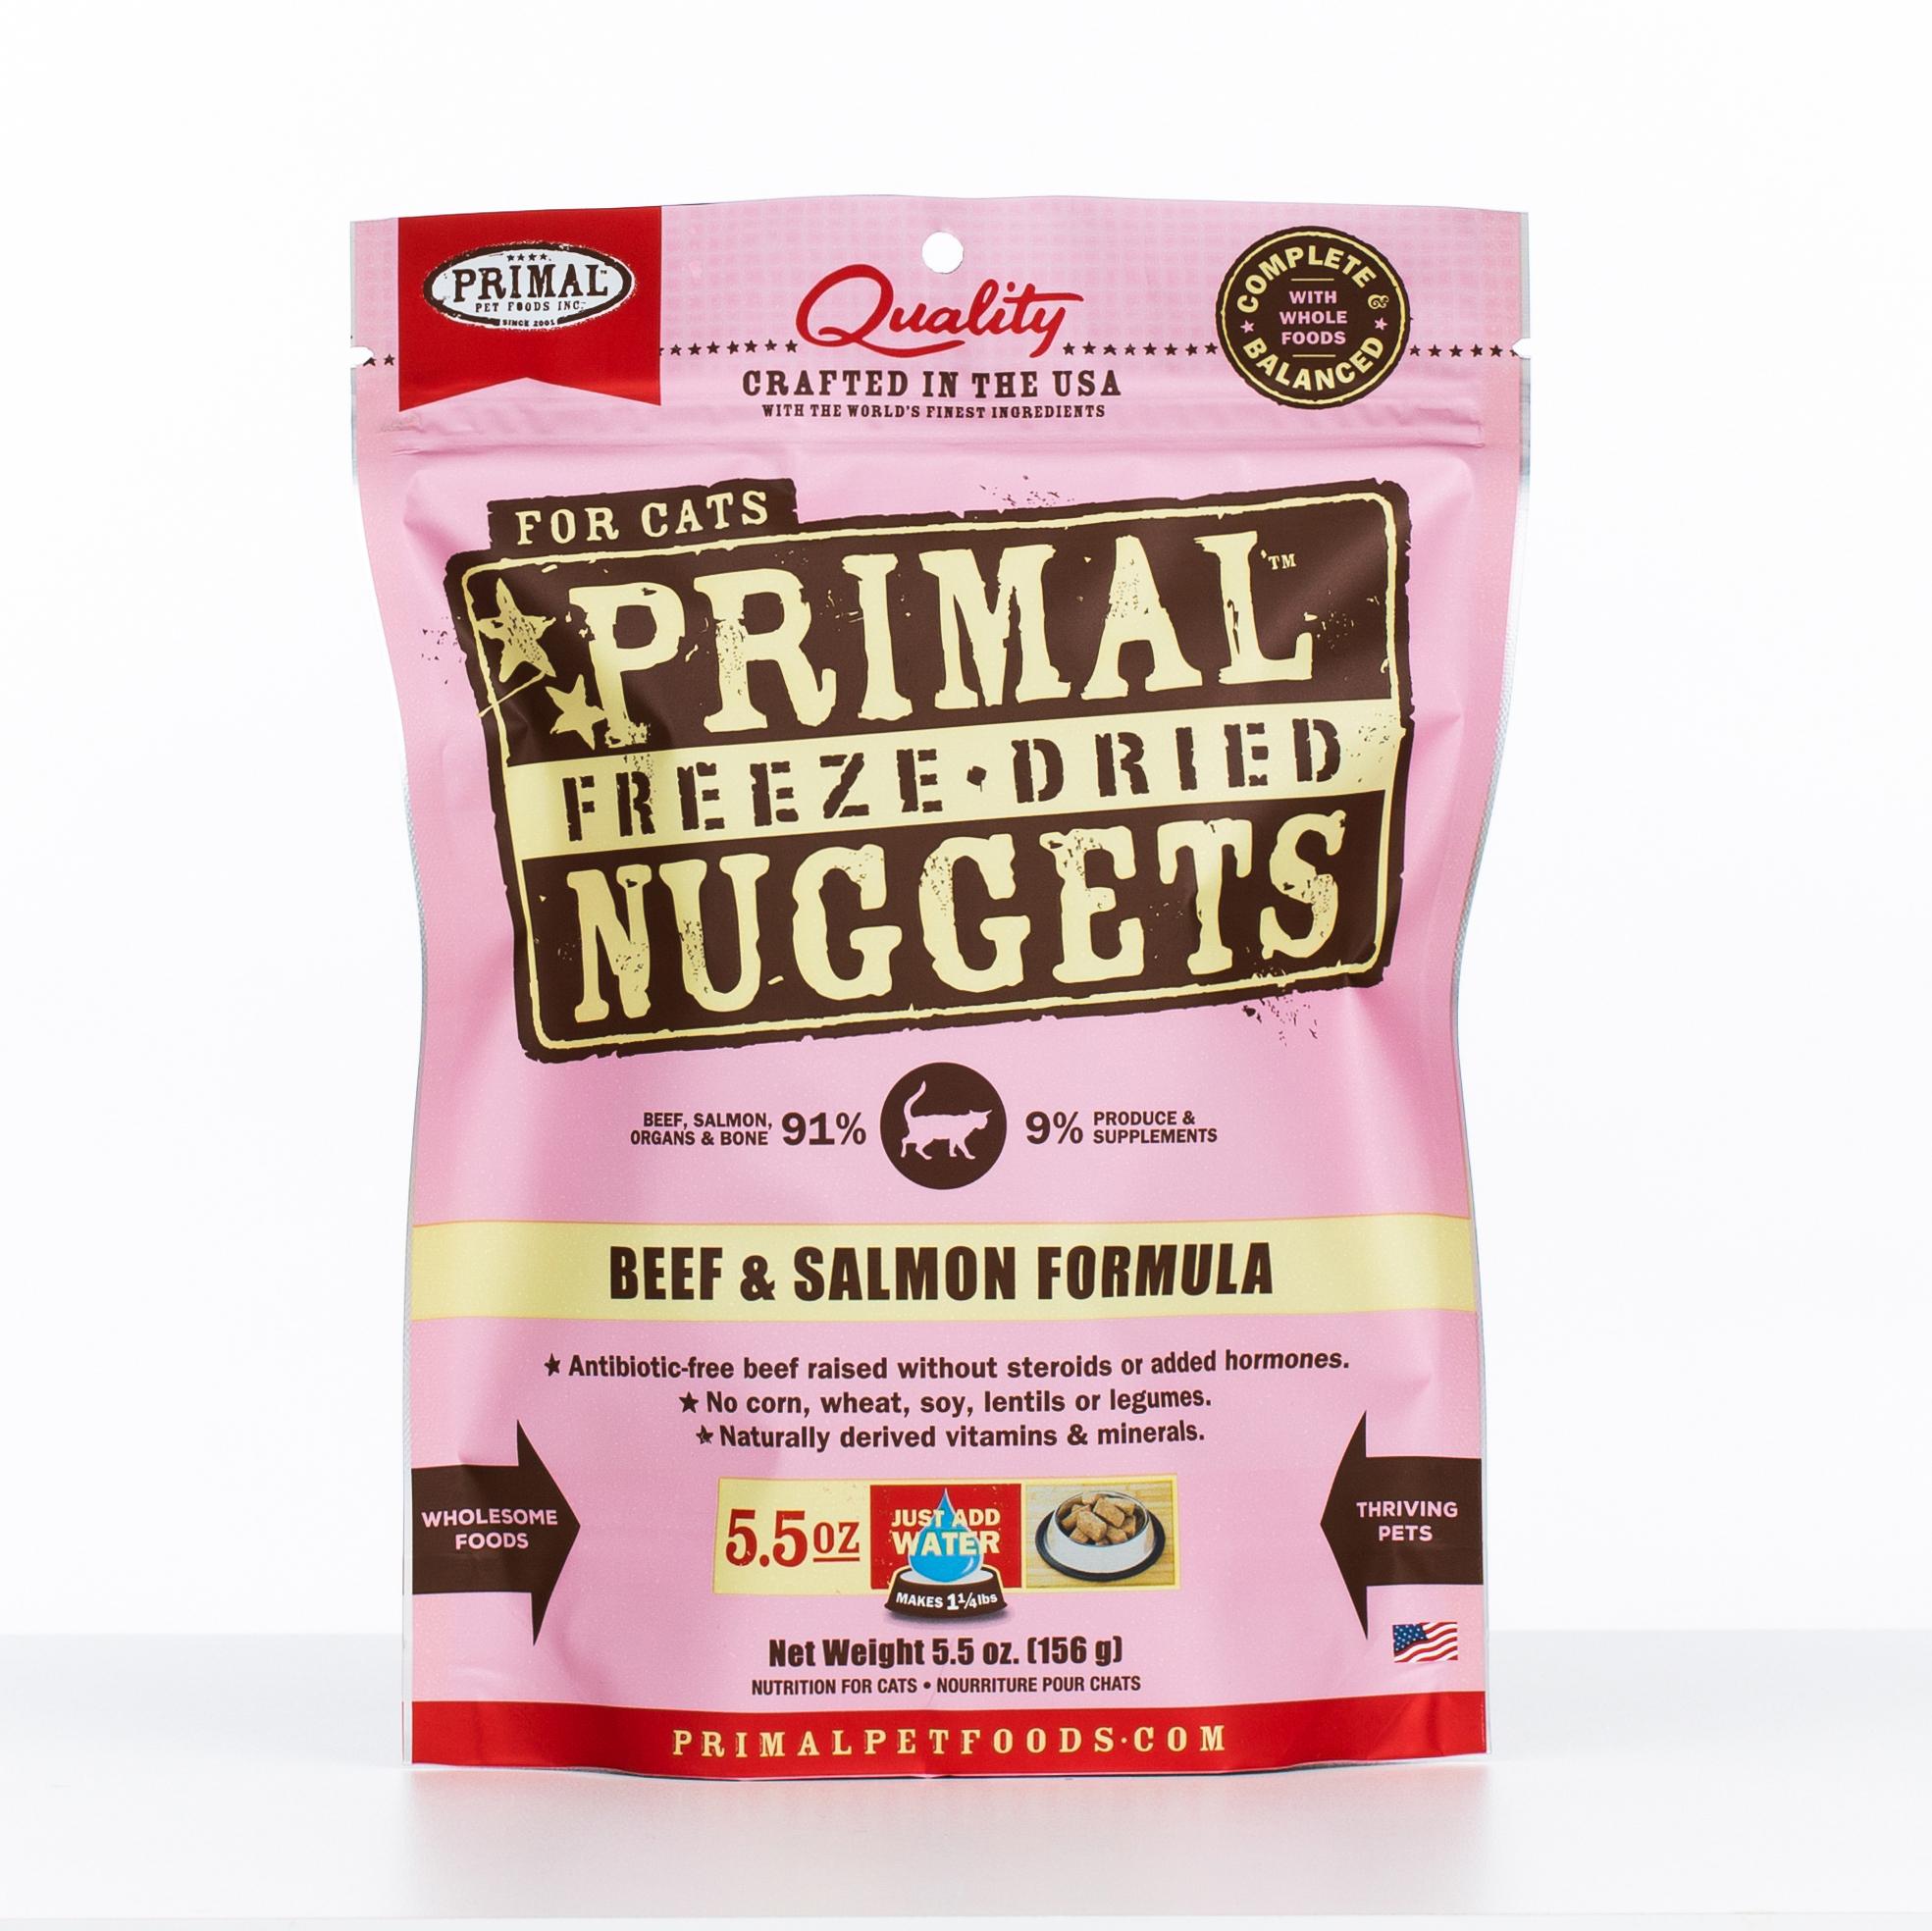 Primal Raw Freeze-Dried Nuggets Beef & Salmon Formula Cat Food, 5.5-oz bag